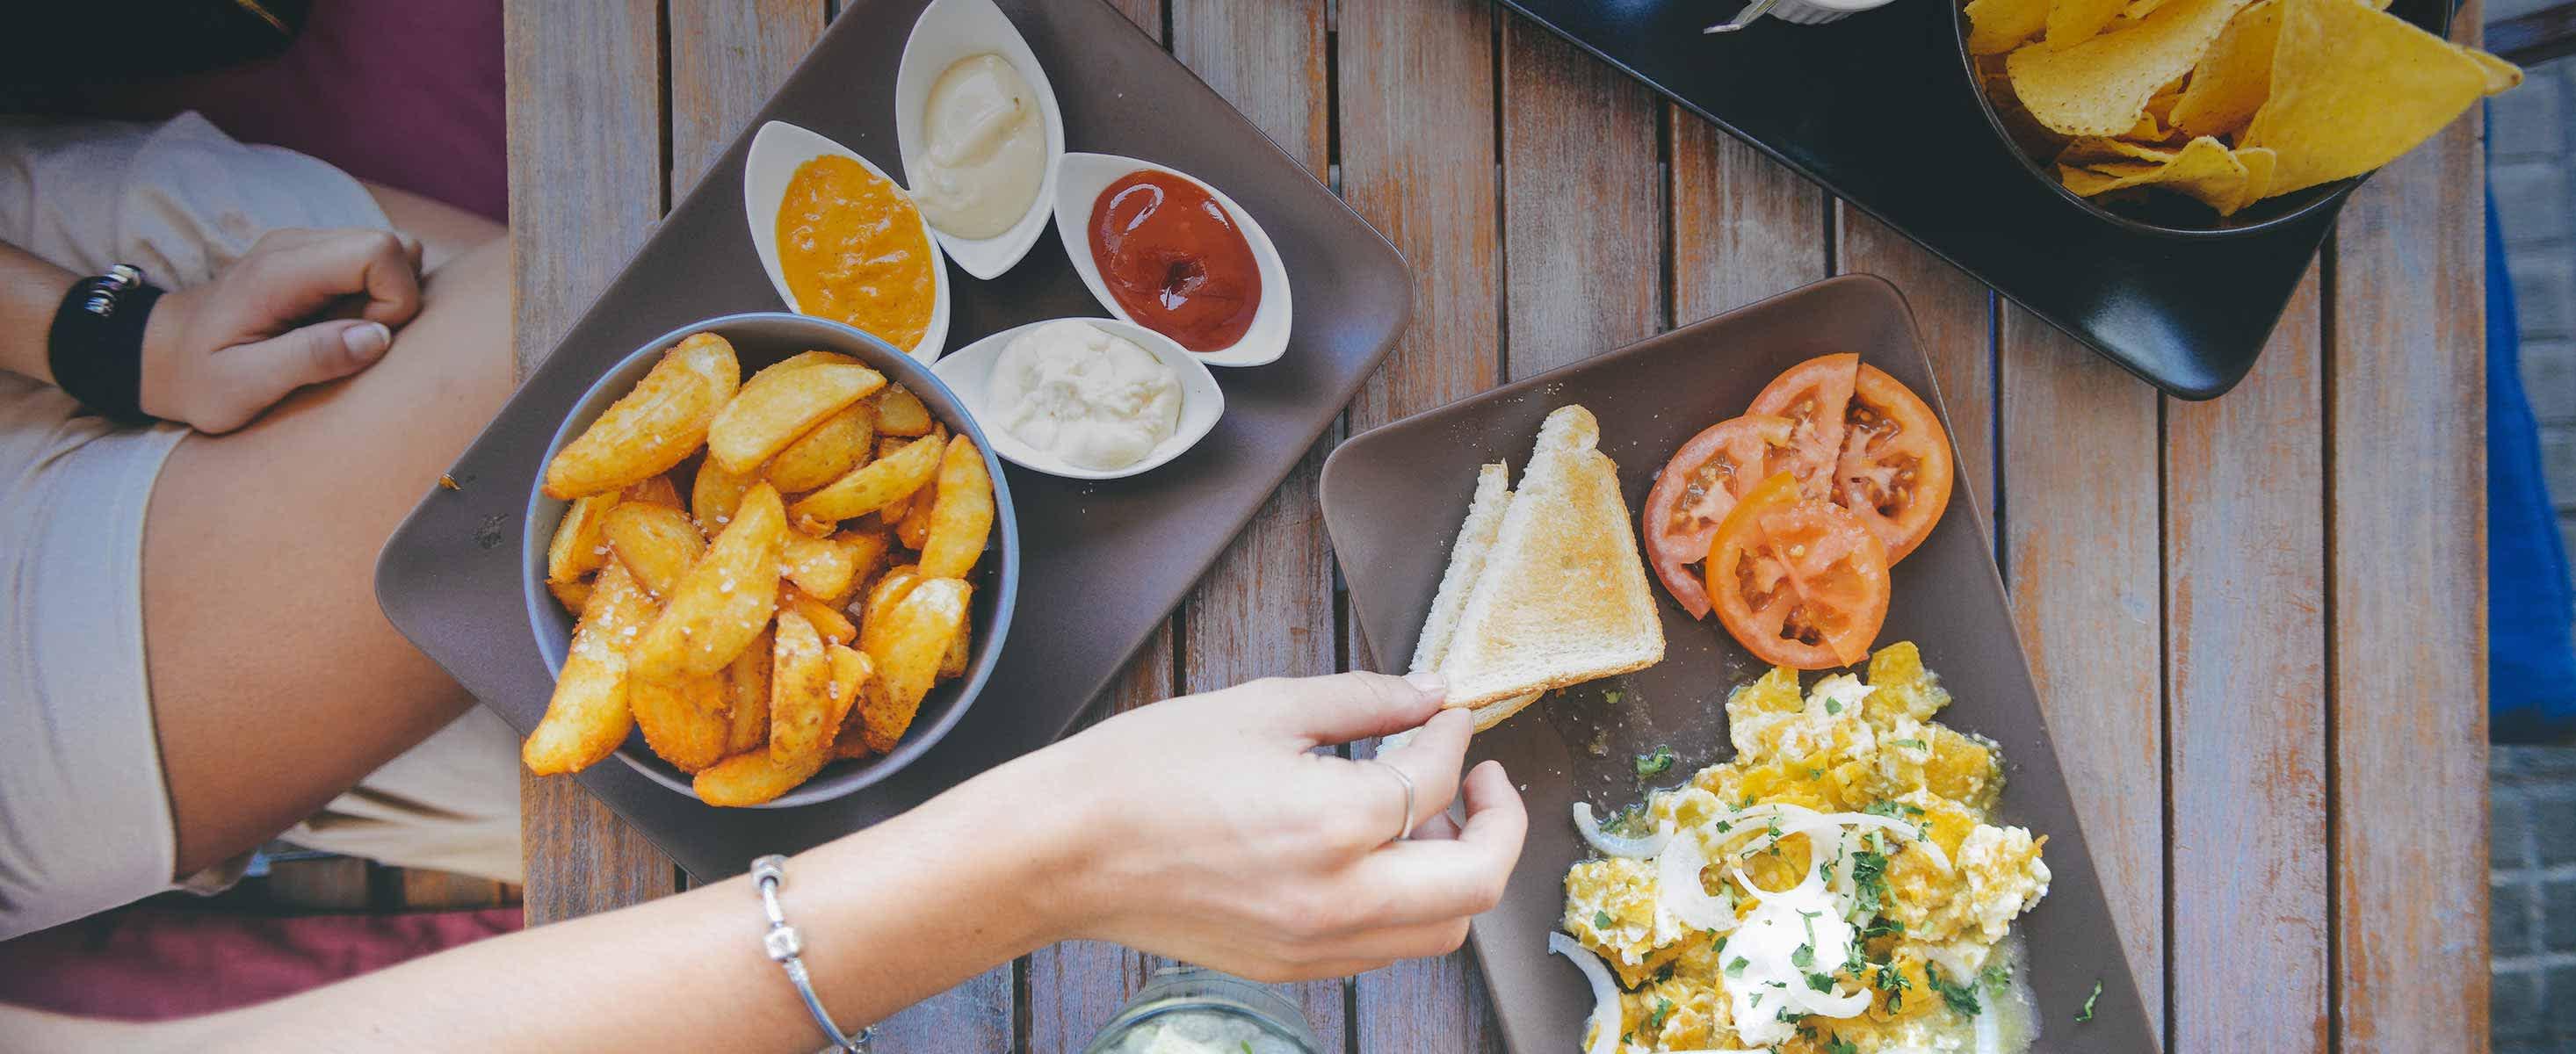 Food And Drink: Food & Drink